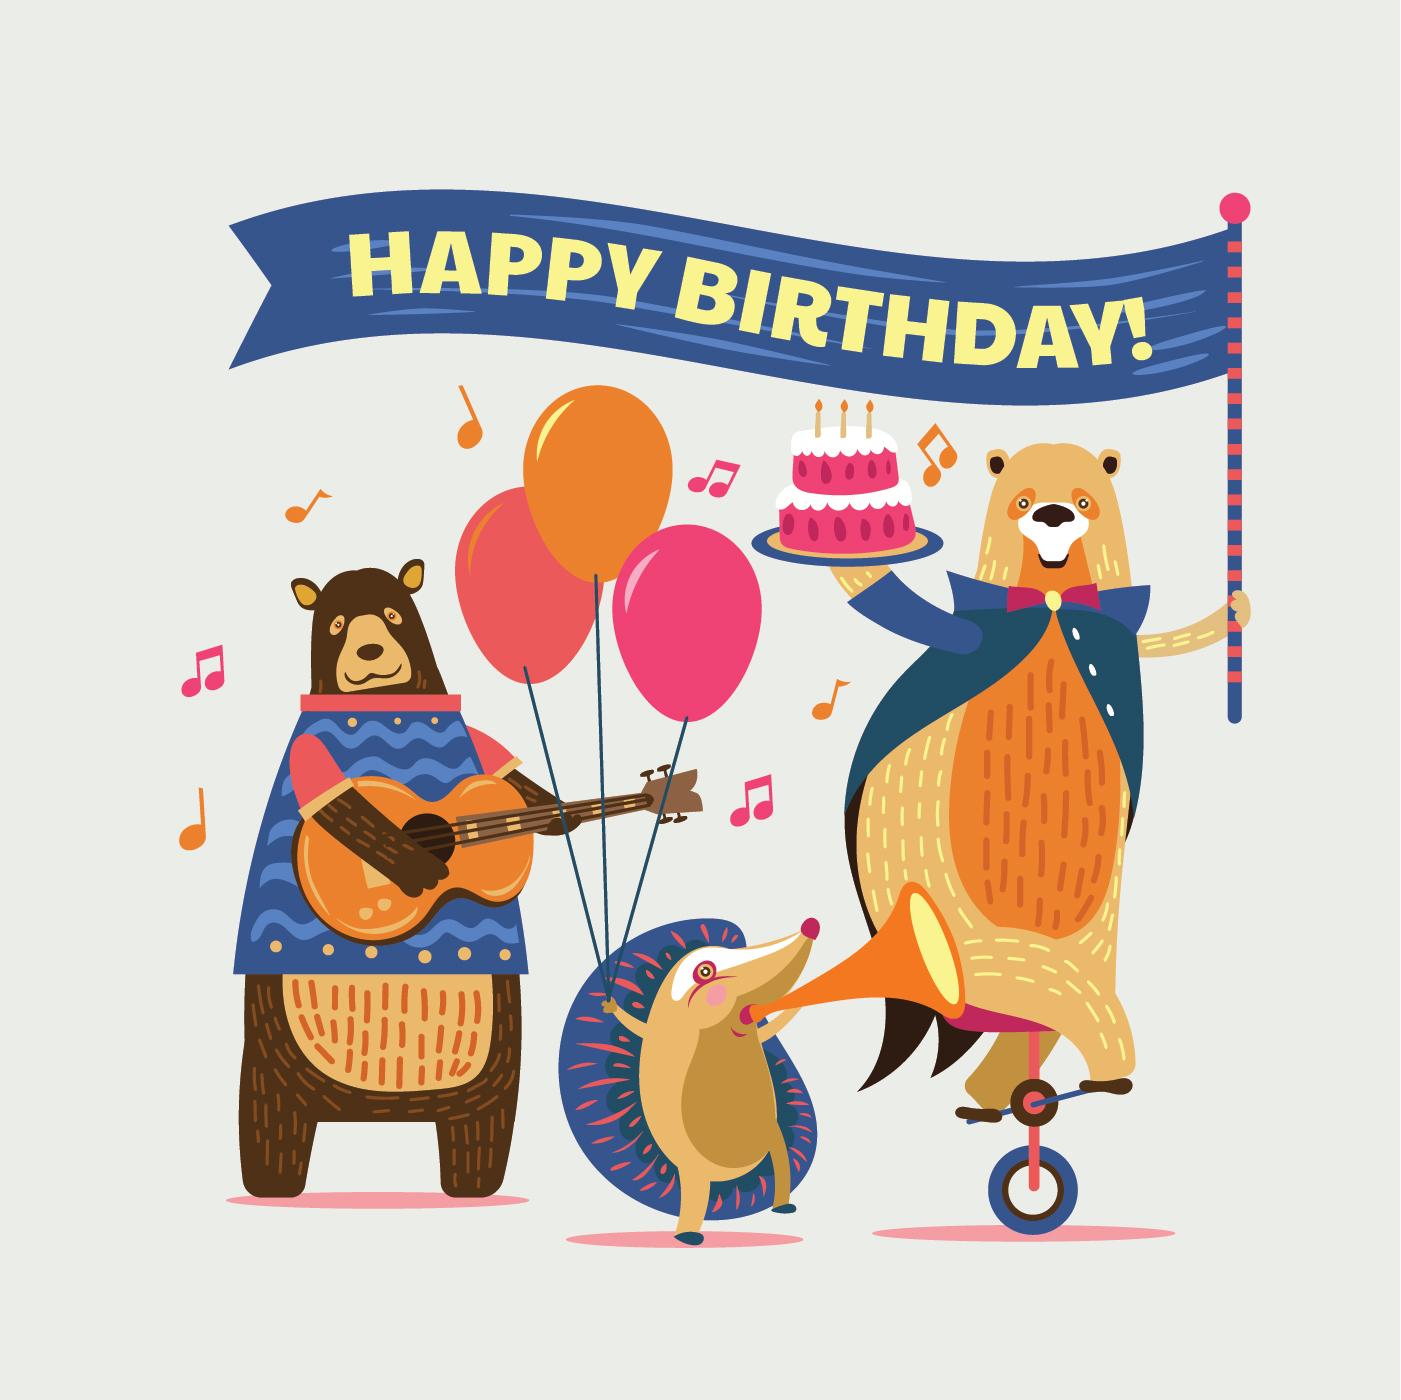 Cute Cartoon Animals Illustration For Kids Happy Birthday